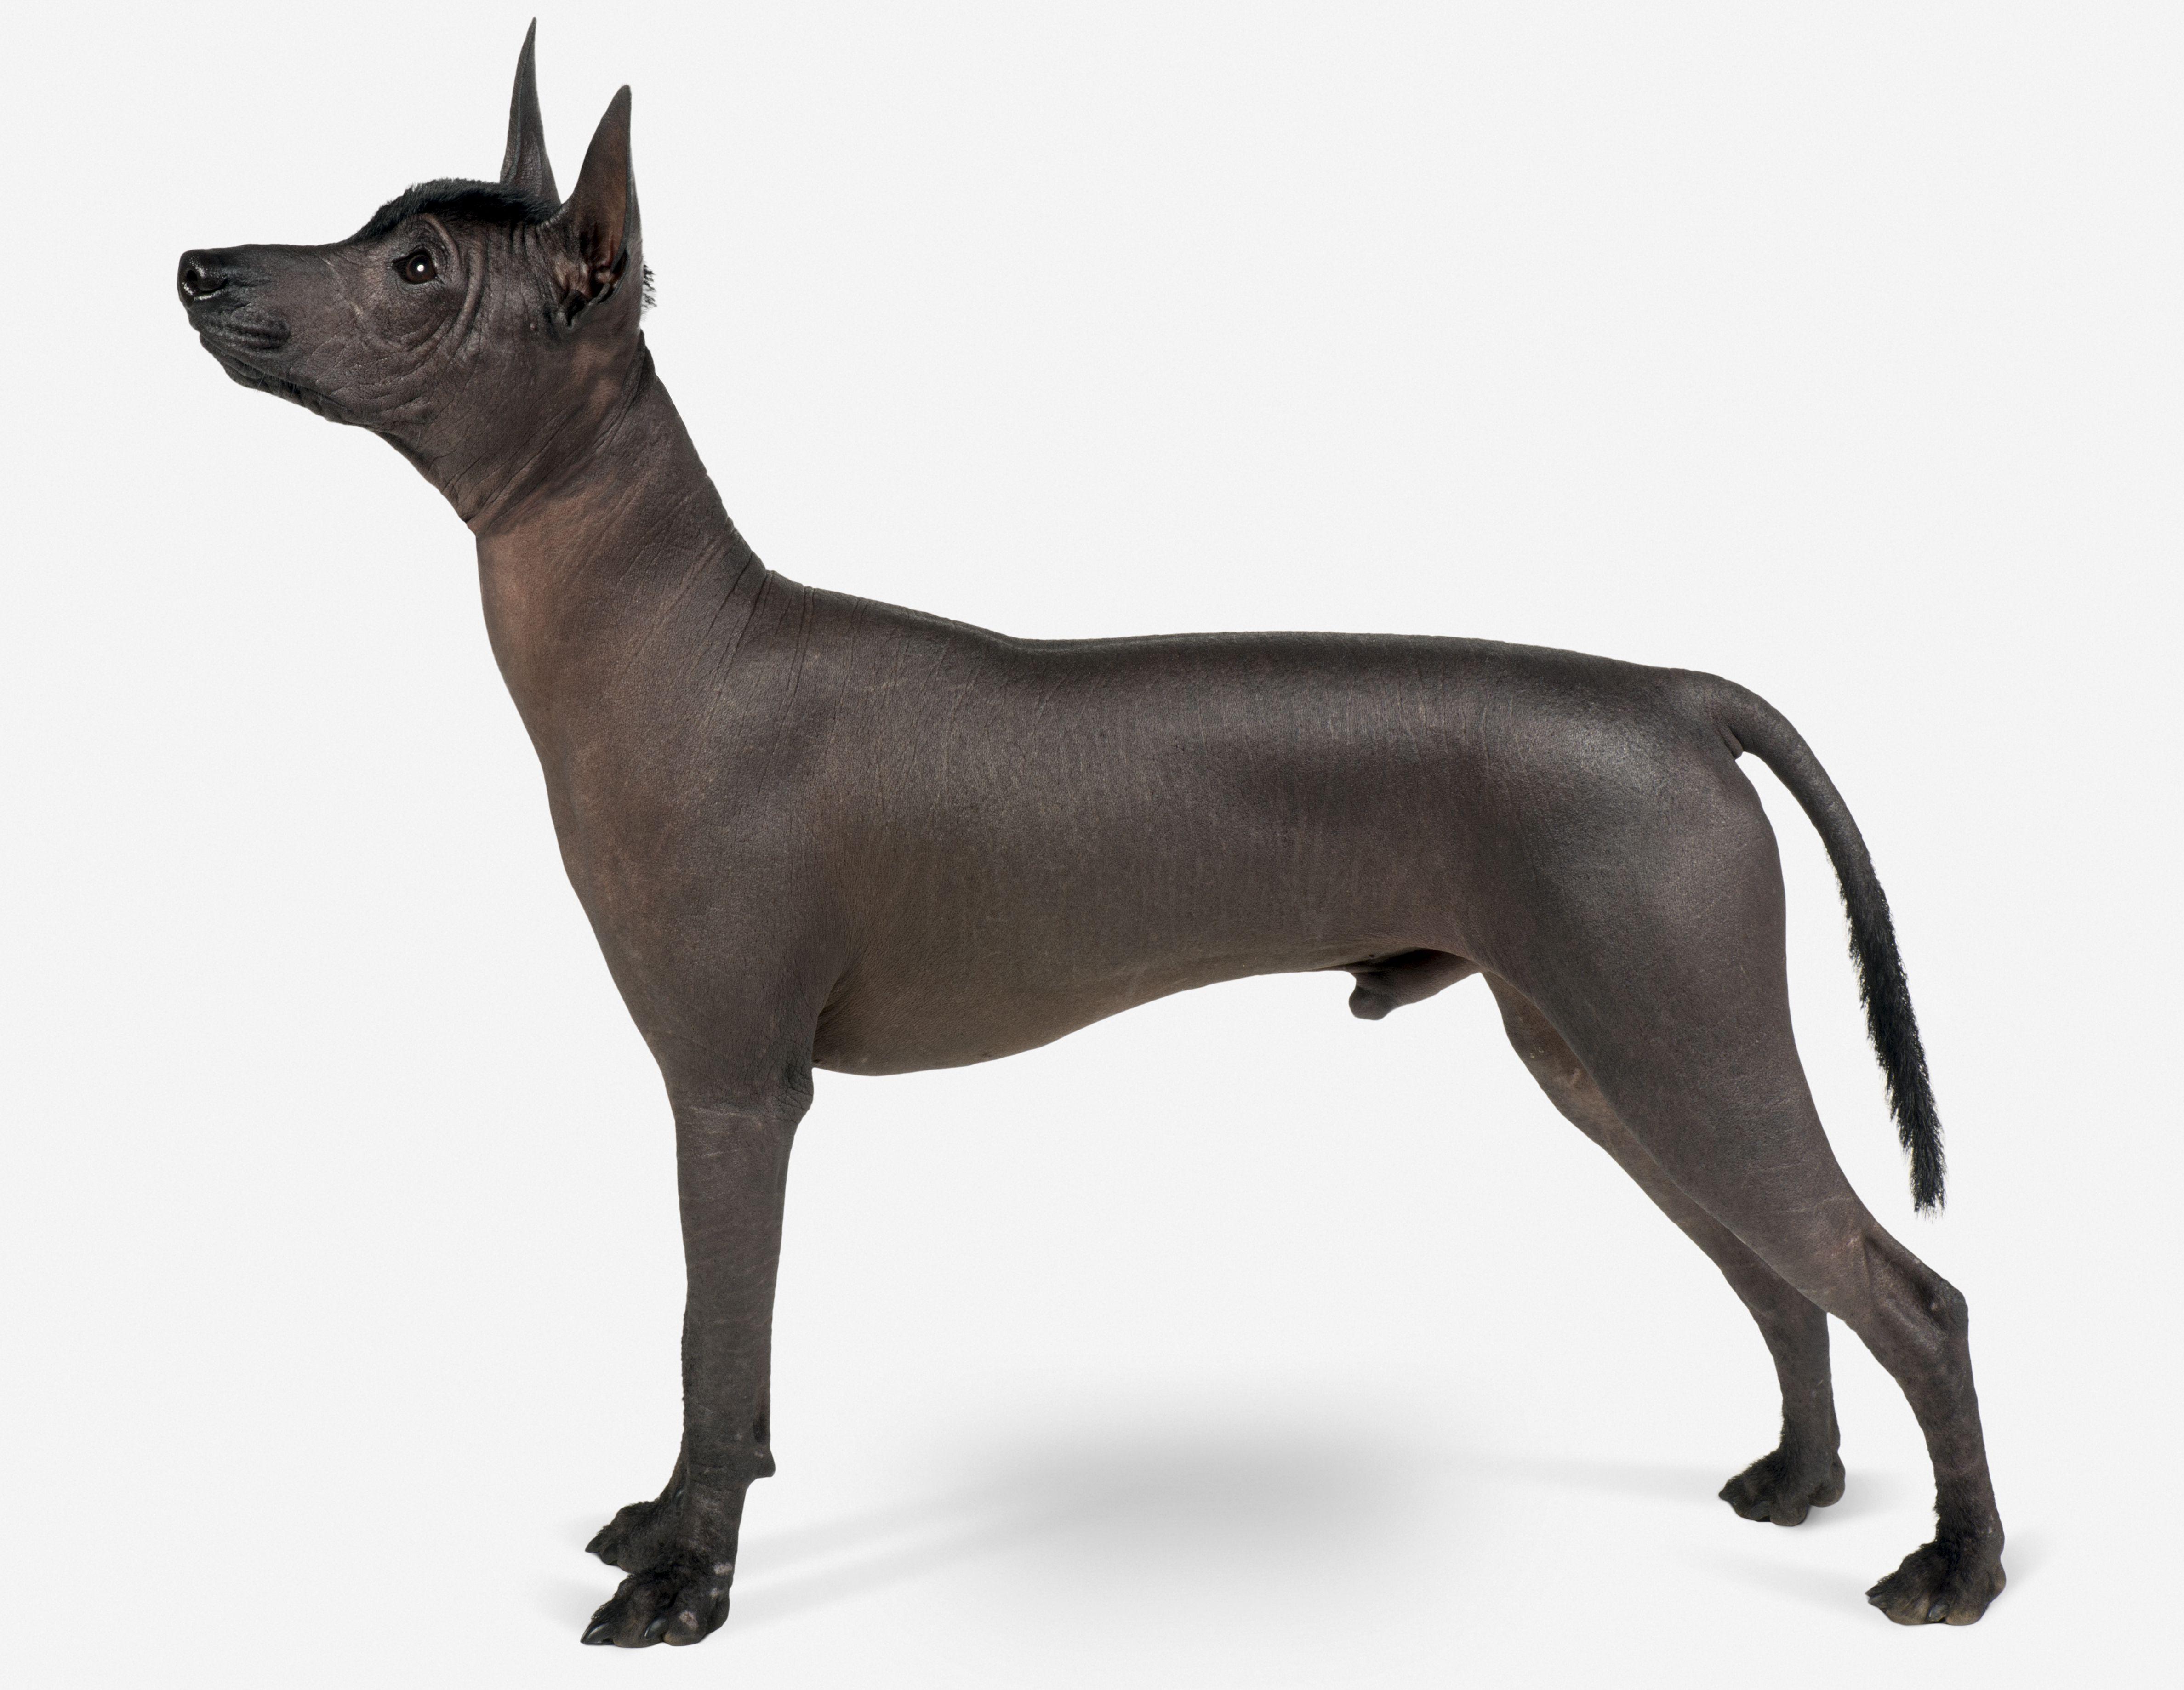 Mexican hairless dog (Xoloitzcuintli)